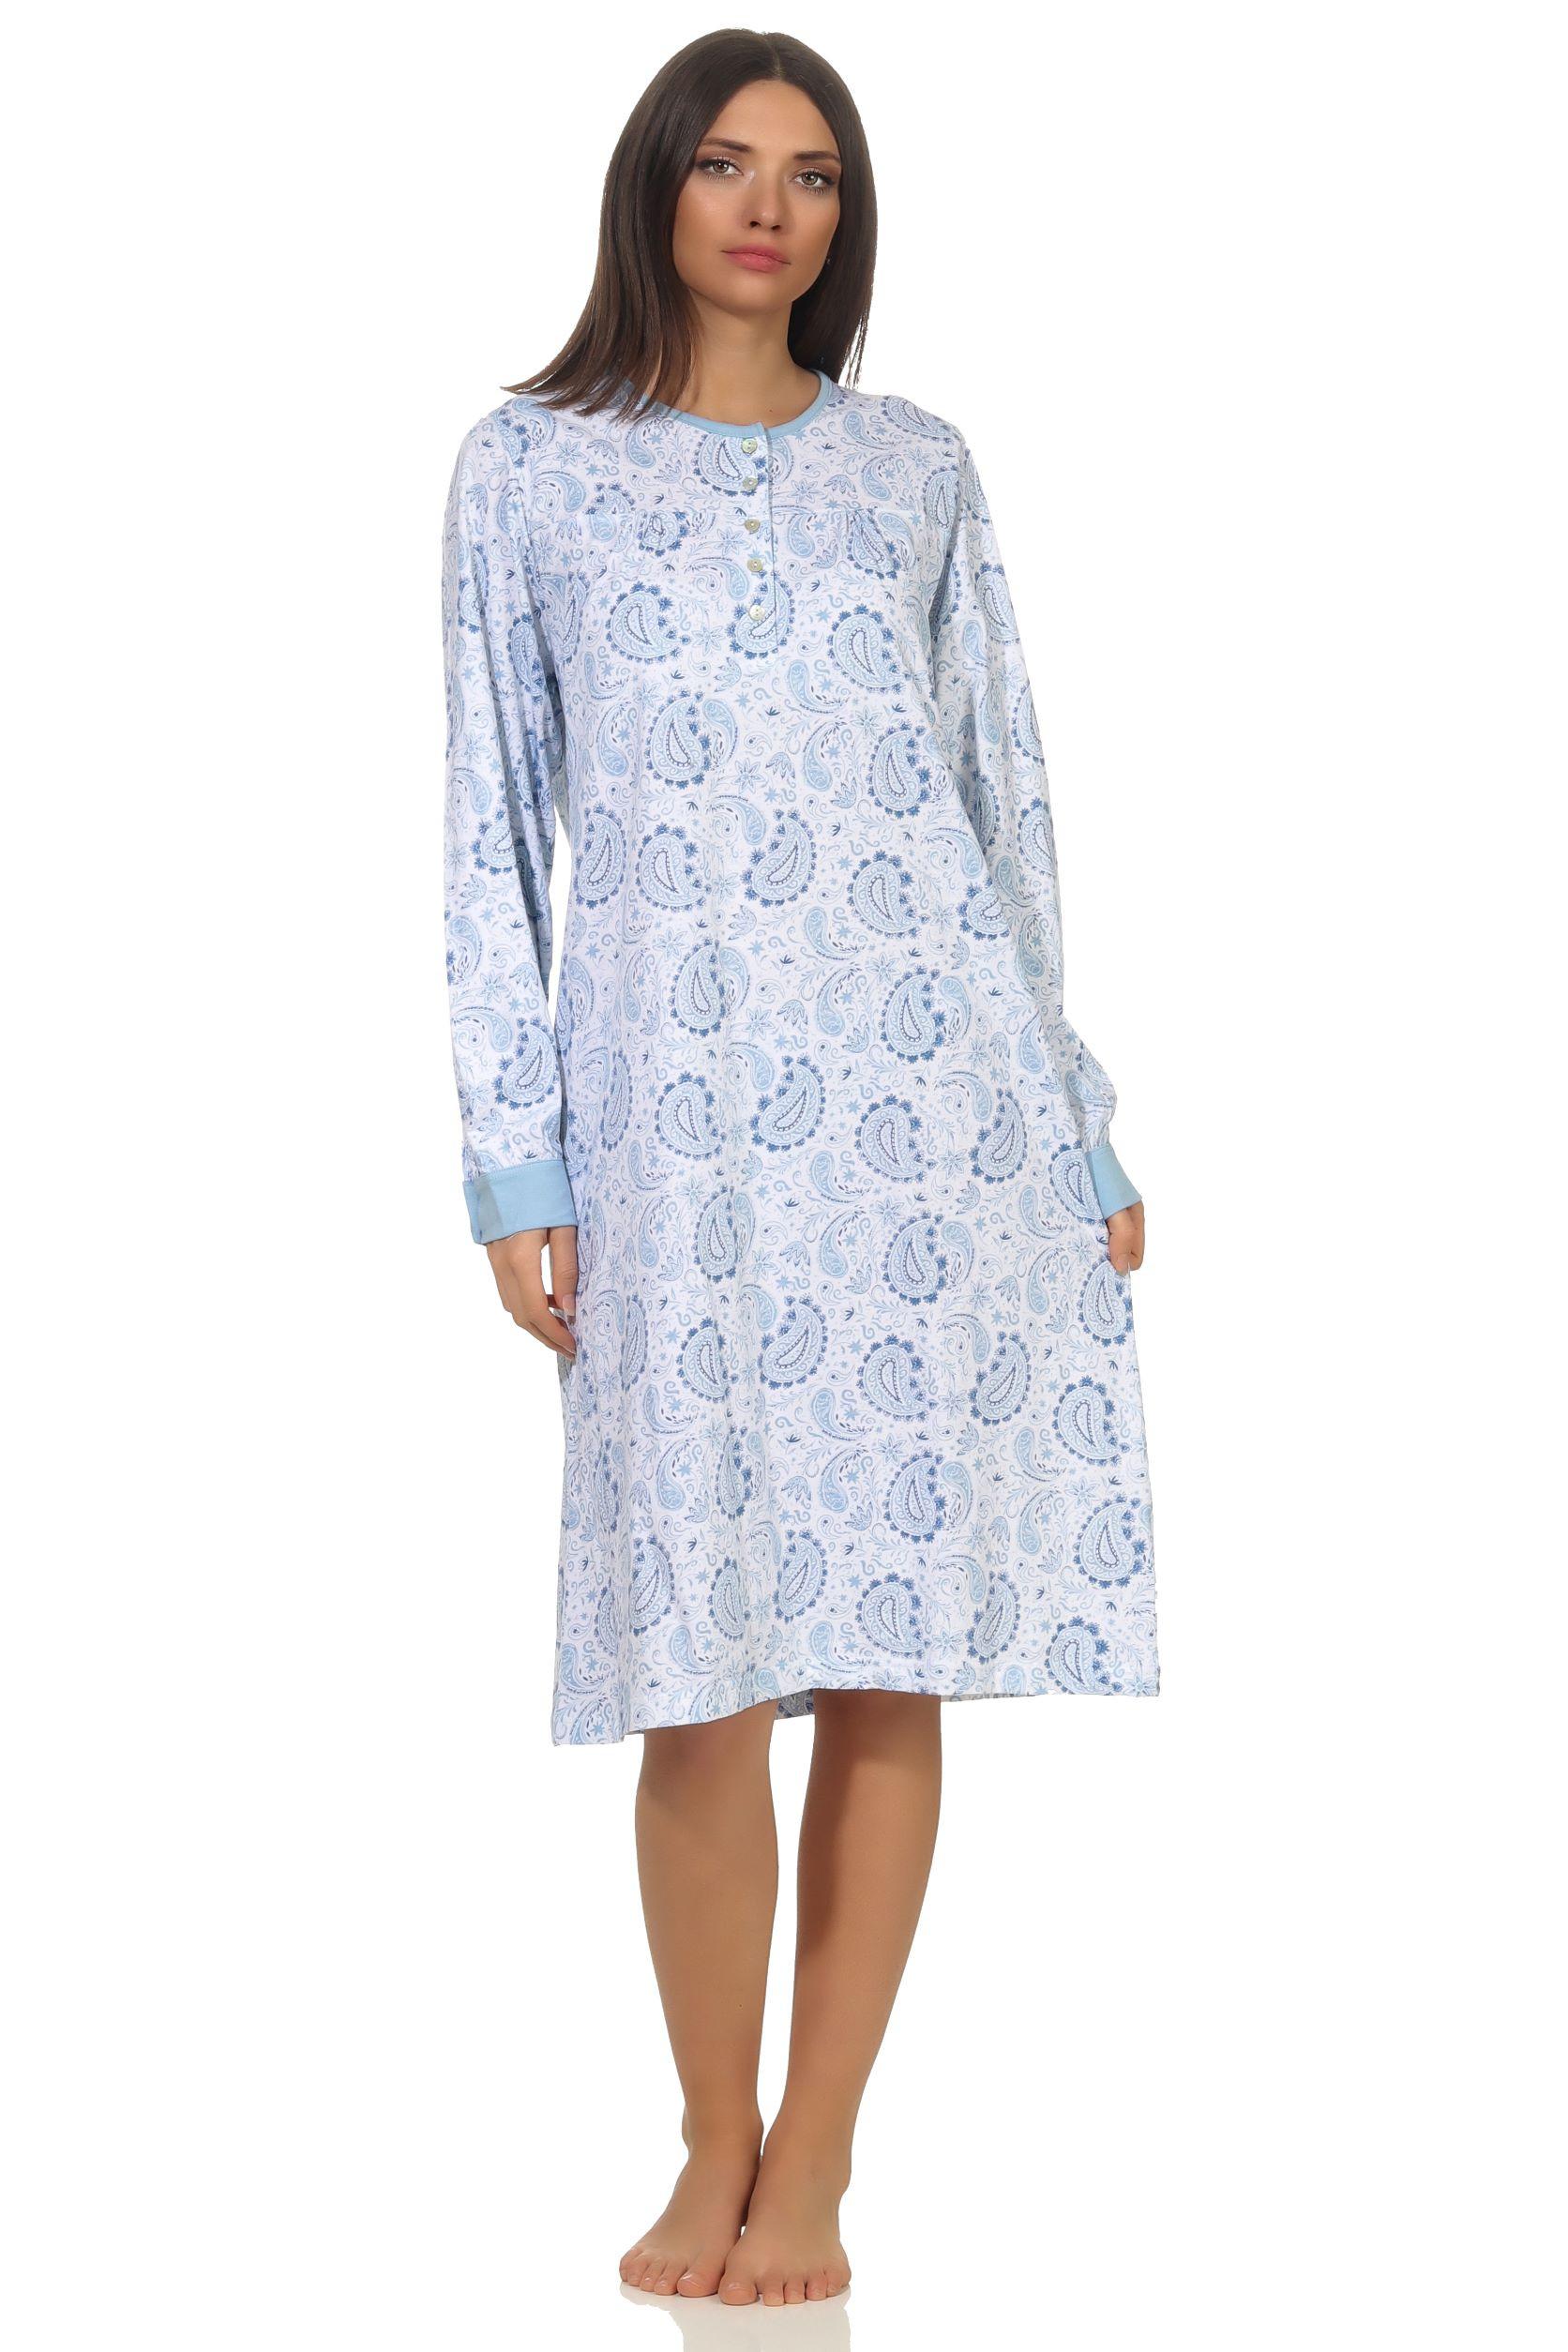 Normann dames nachthemden Creative 67437-S 36/38-Blauw